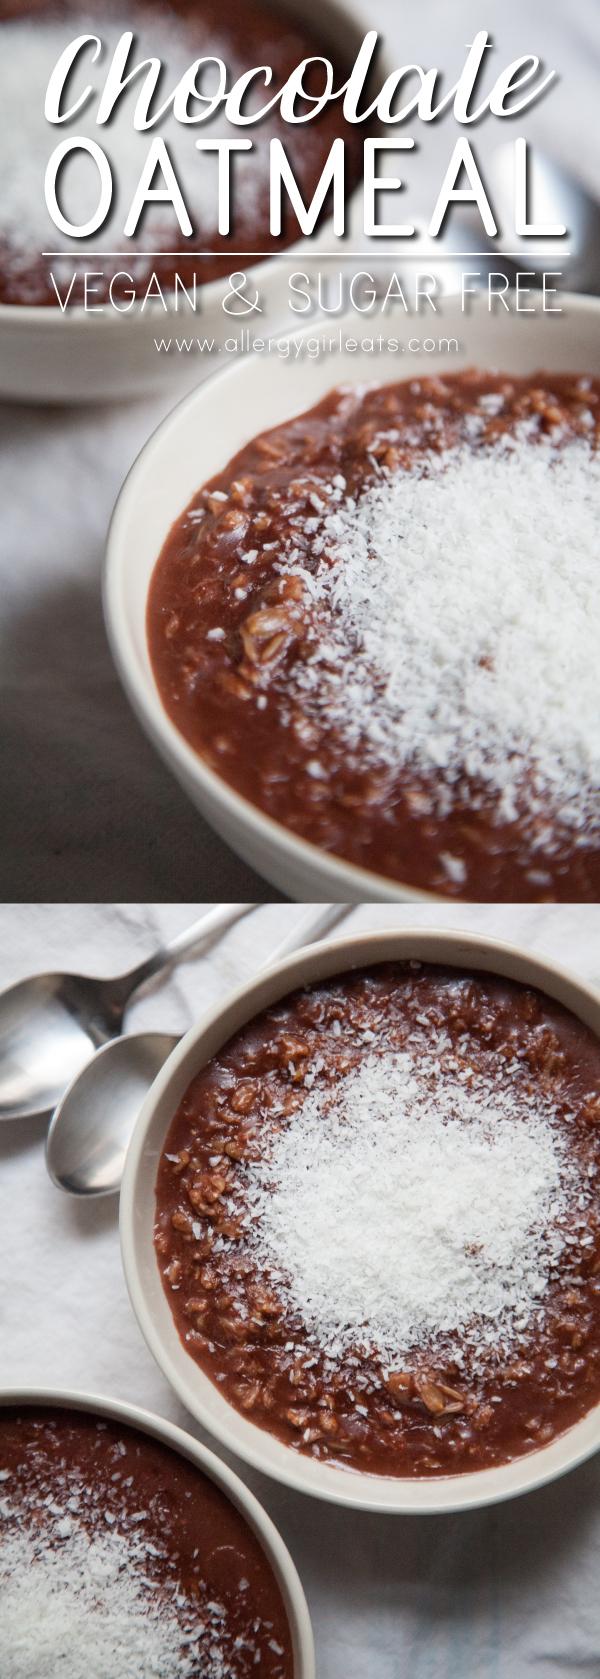 Vegan Chocolate Oatmeal - top 8 free & sugar-free oatmeal